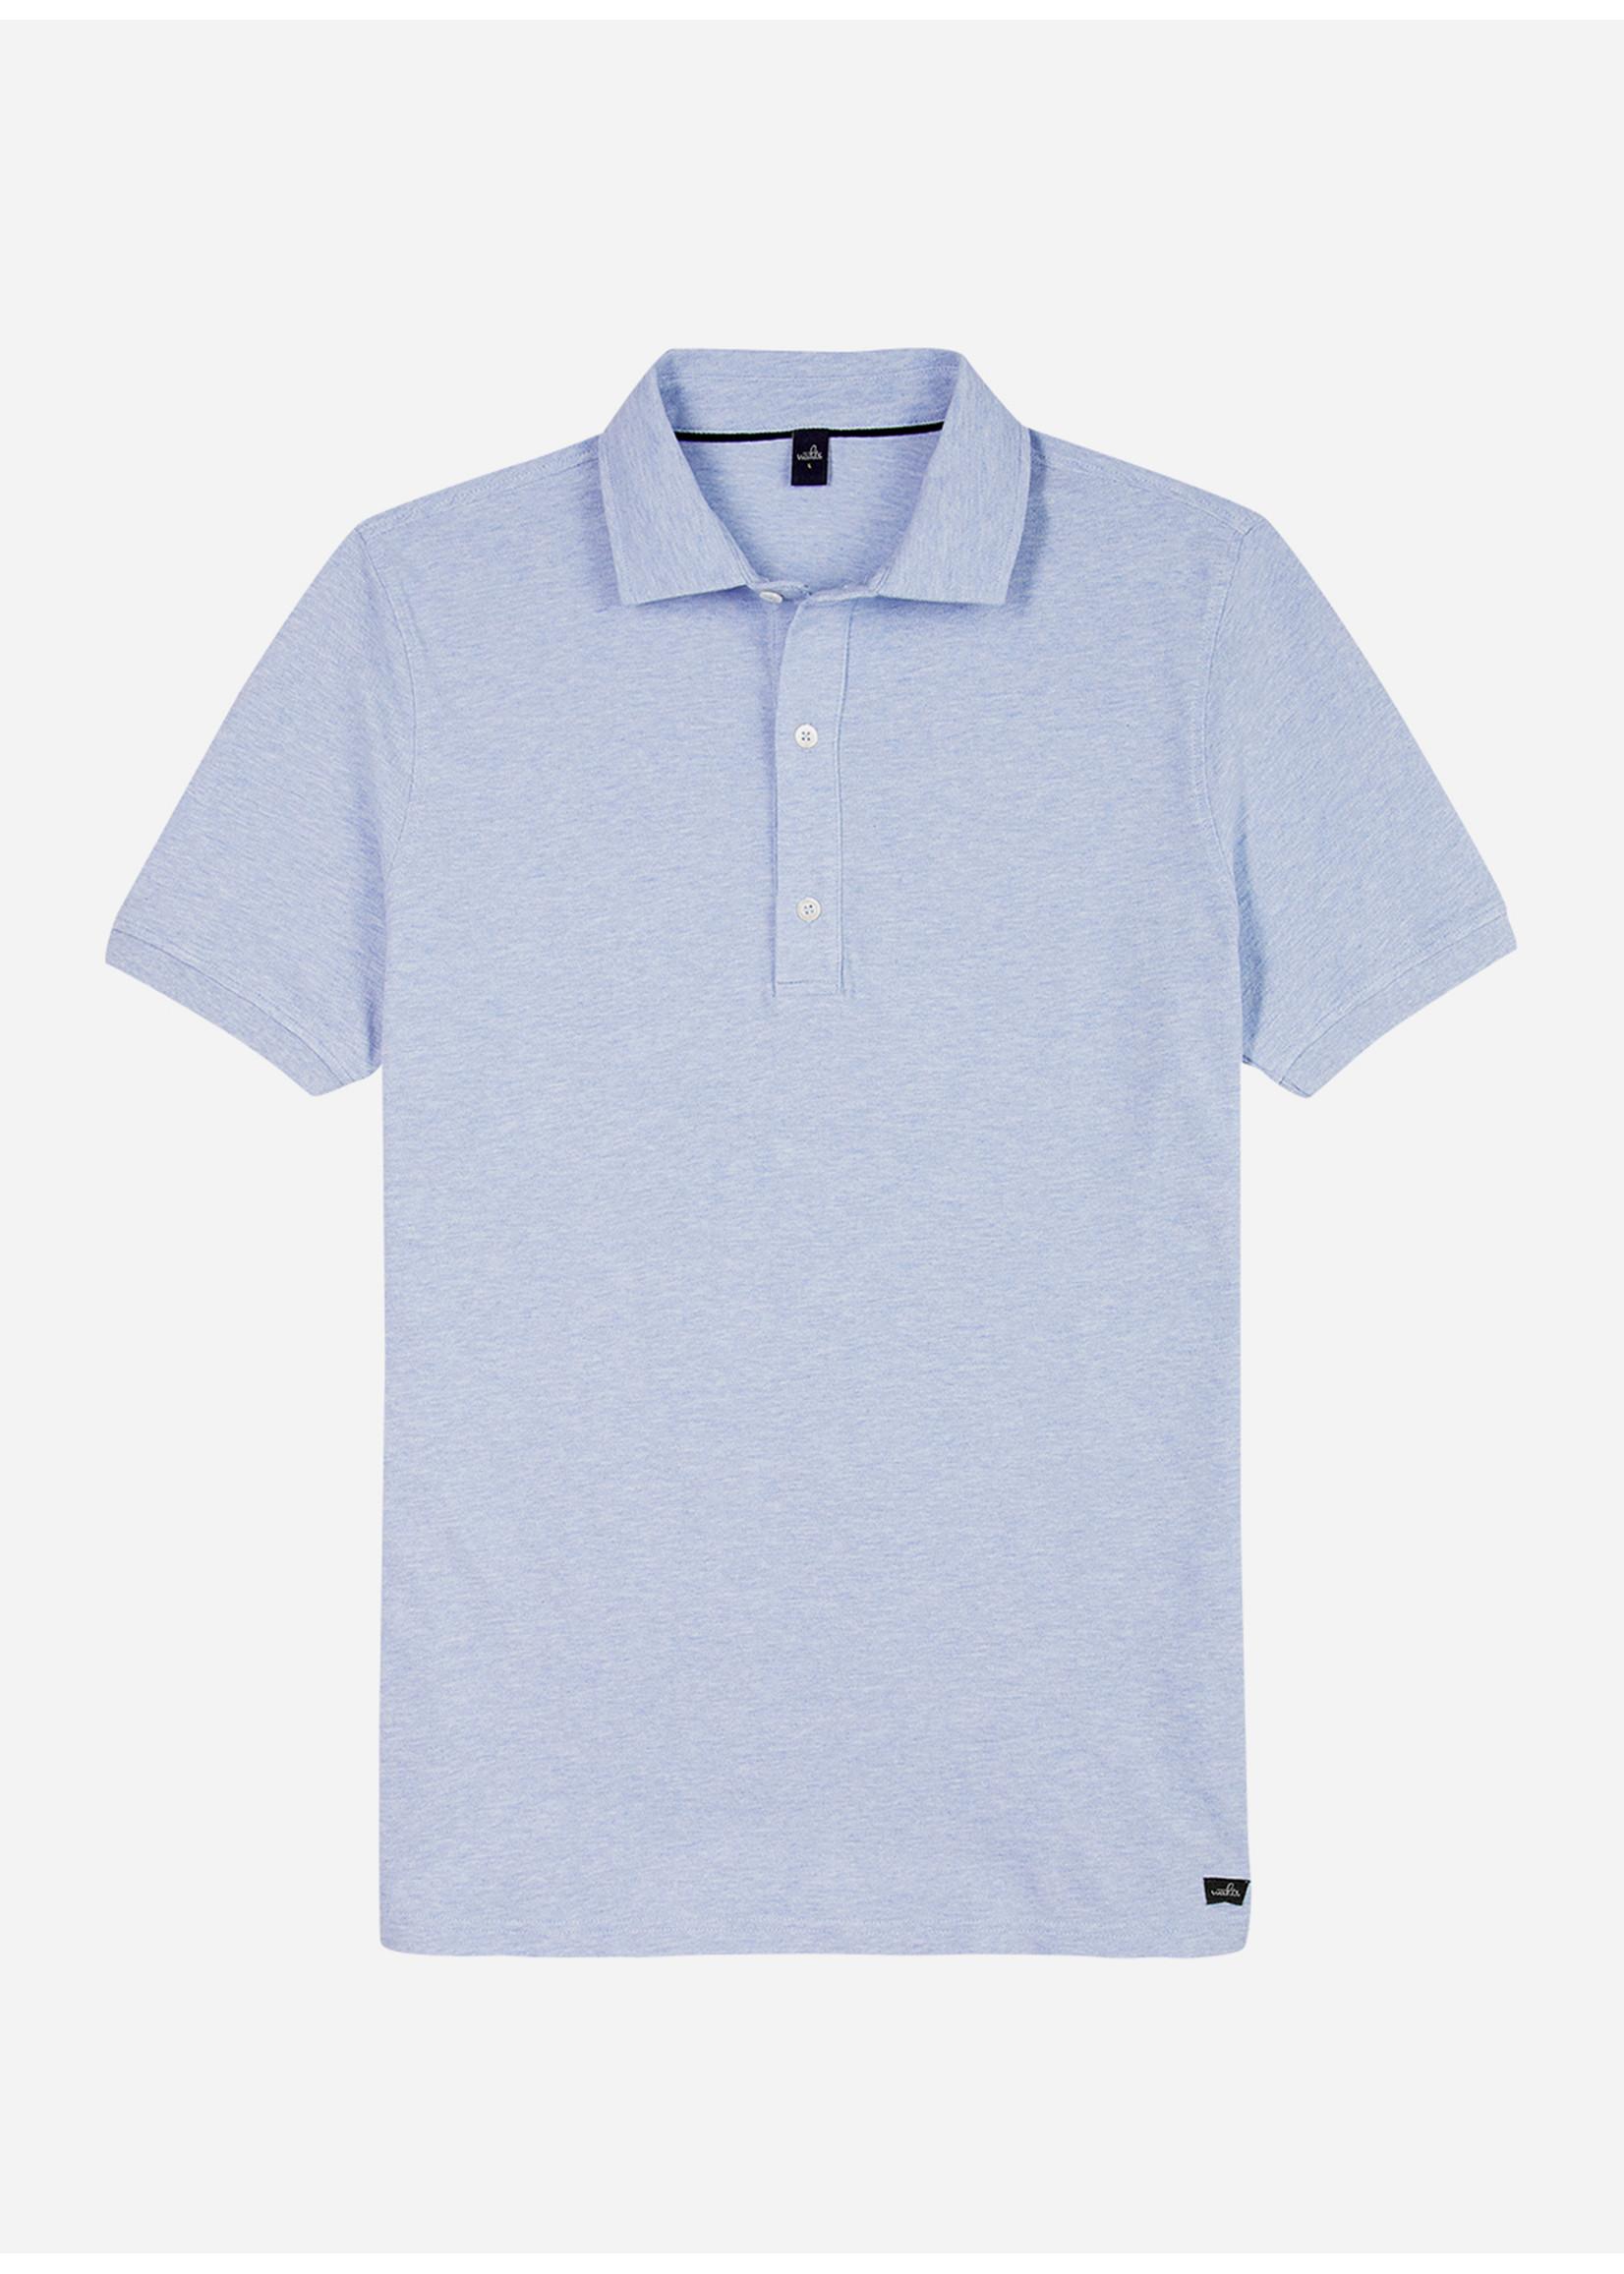 Wahts Davis tailored polo shirt light blue